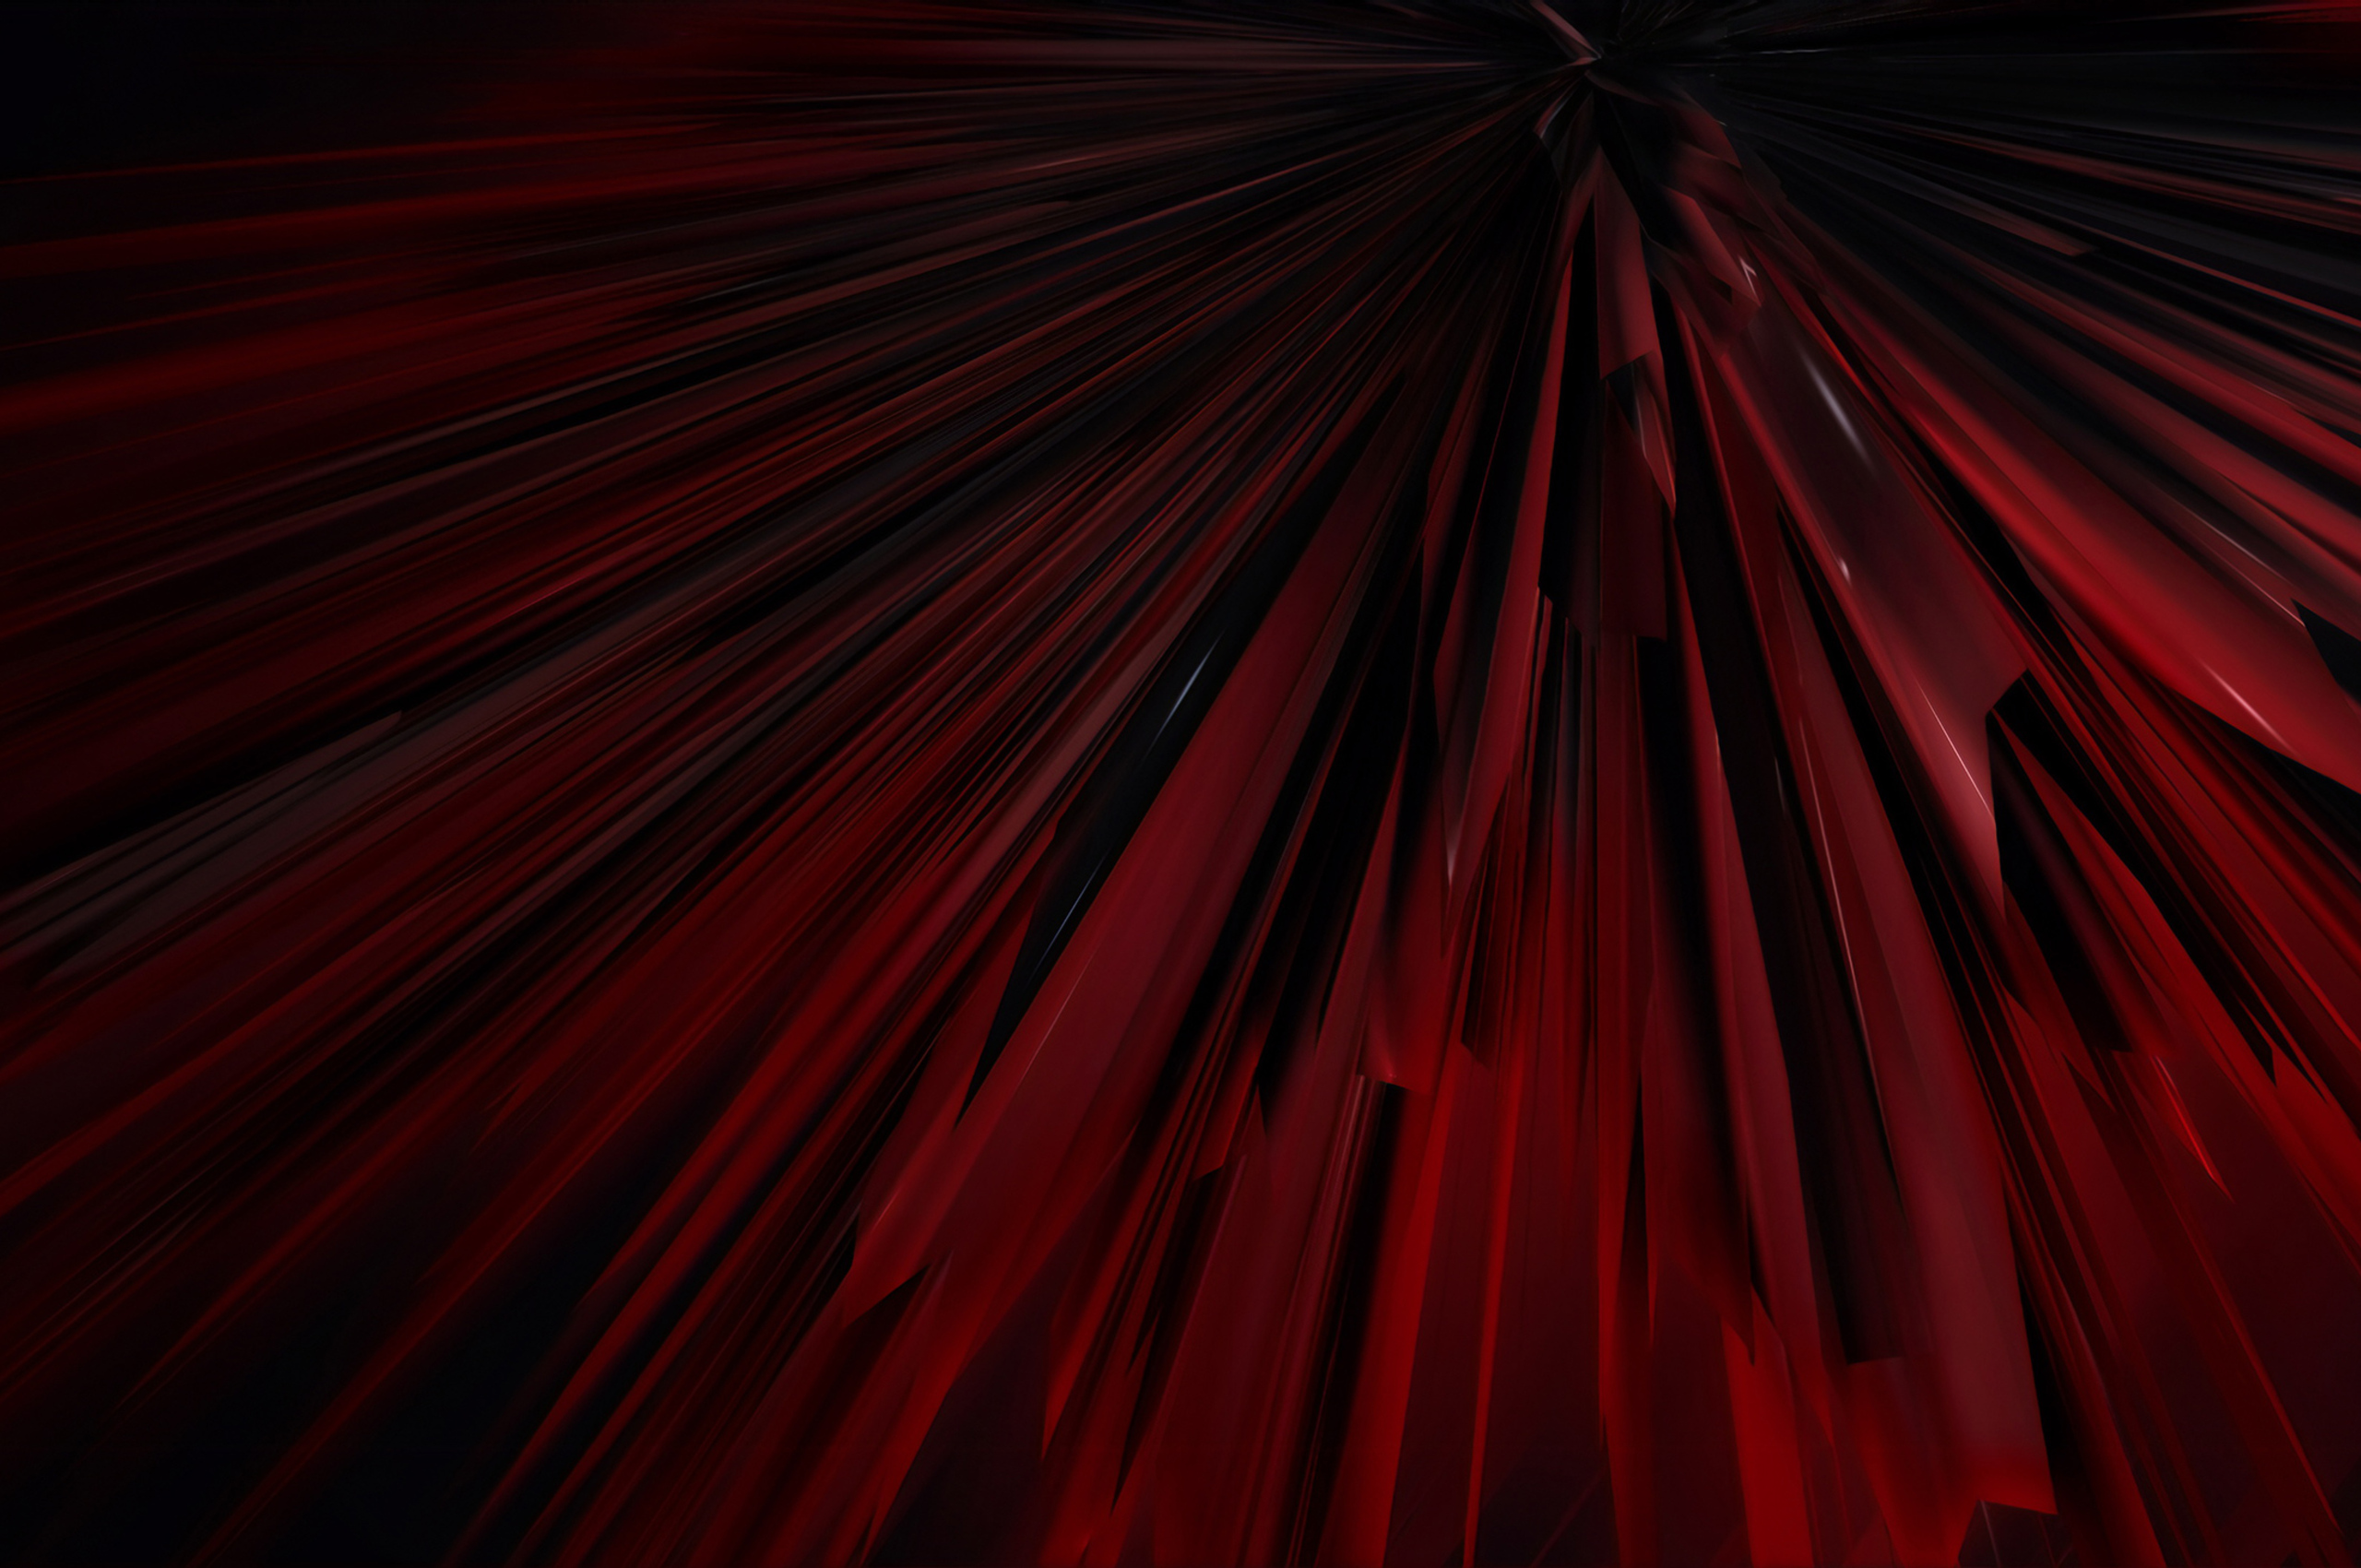 red-box-abstract-6u.jpg